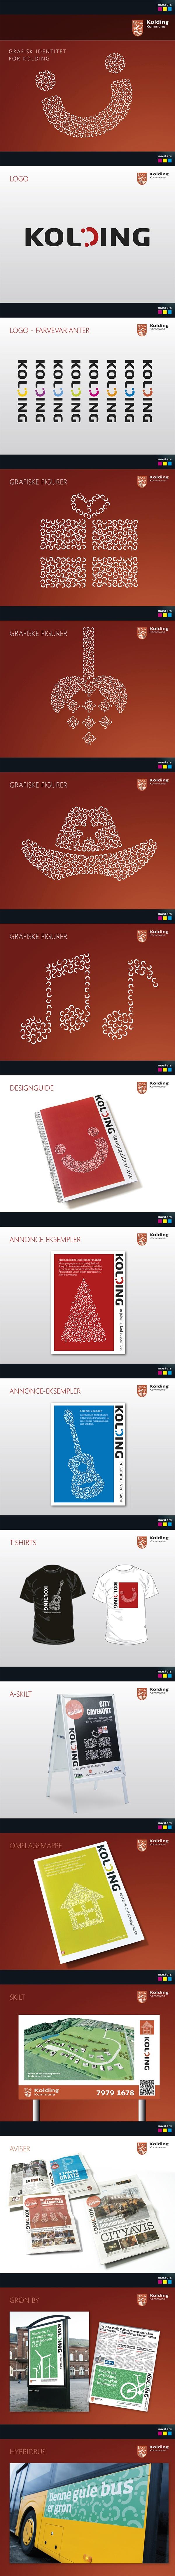 Grafisk identitet for Kolding by Masters Reklame, via Behance #mastersreklame